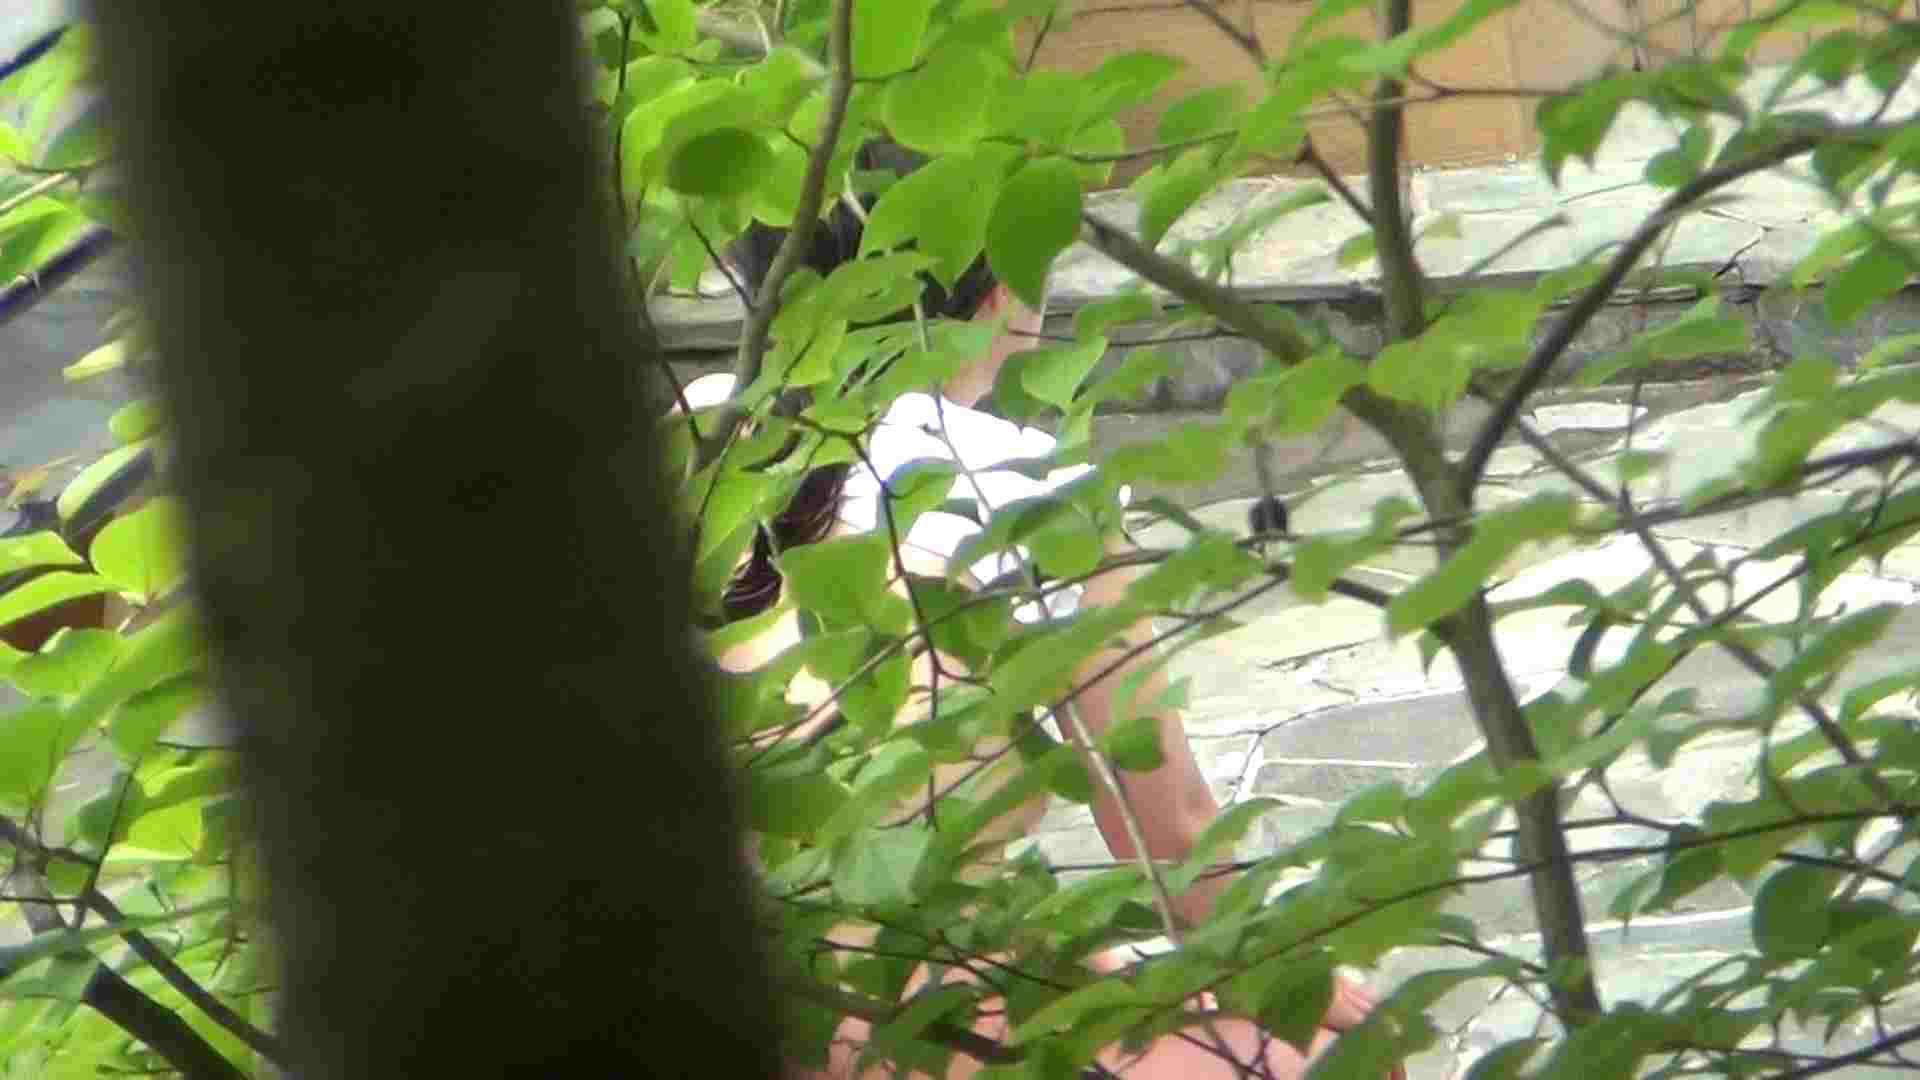 Vol.30 品のある美女 タオルと葉が憎い 高画質動画 オマンコ動画キャプチャ 78画像 57